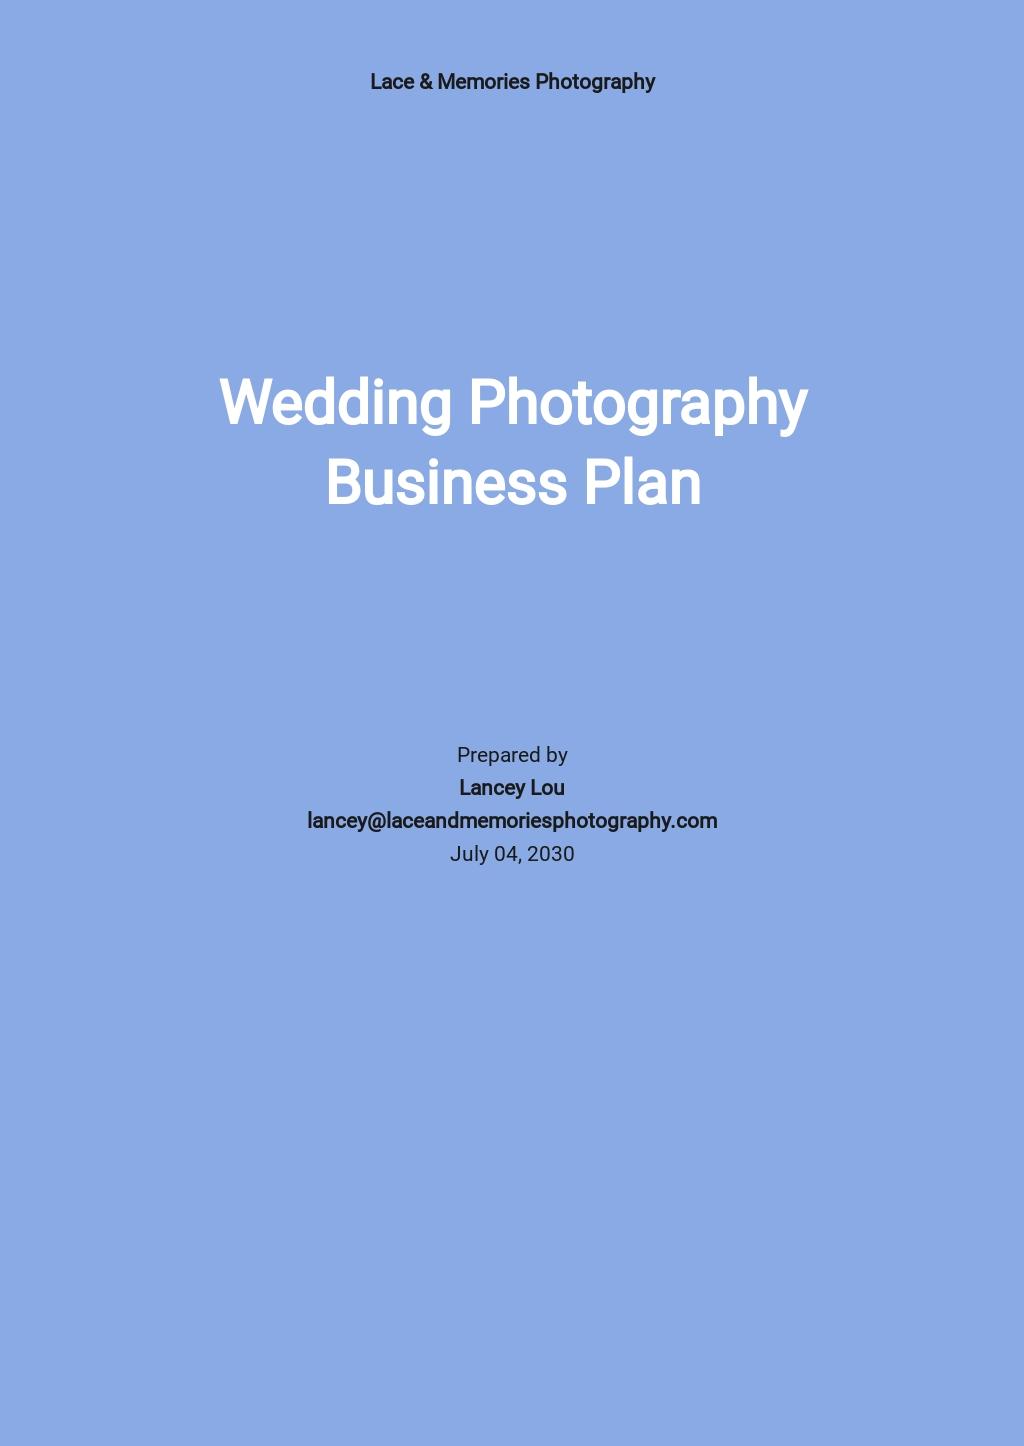 Wedding Photography Business Plan Template.jpe